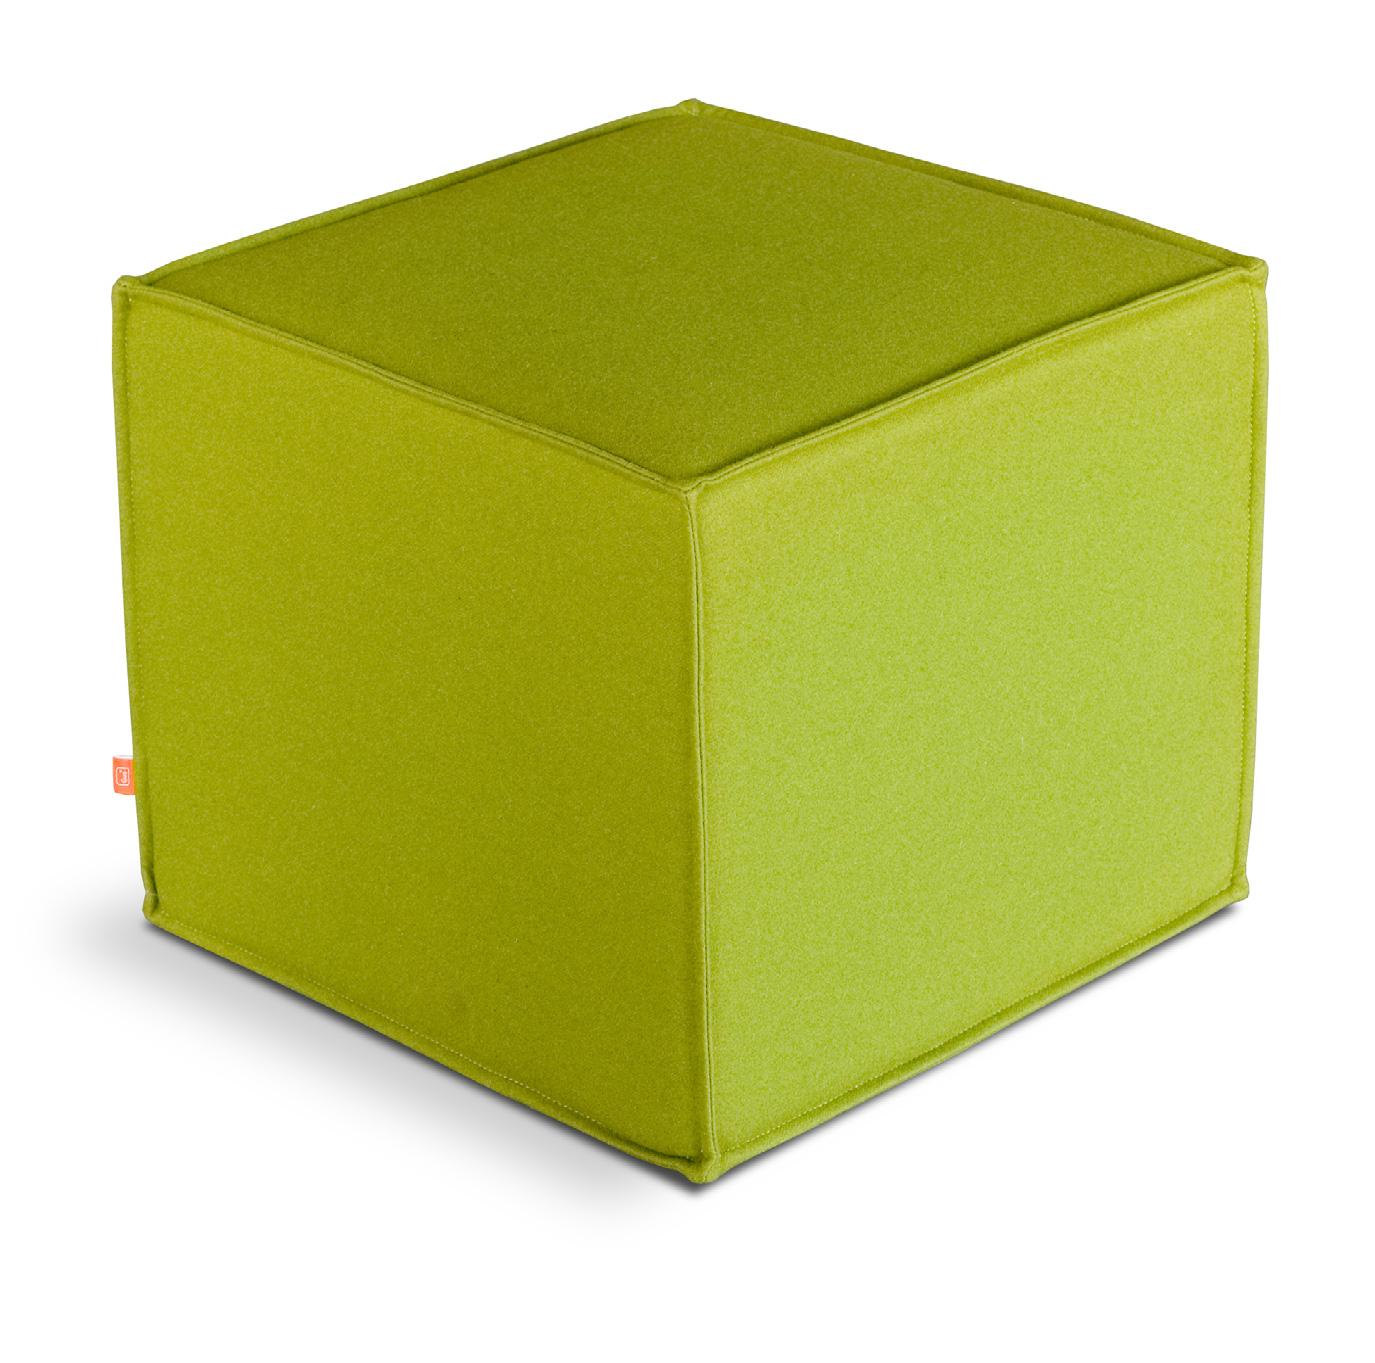 gus modern henry ottoman - gus modern jasper cube